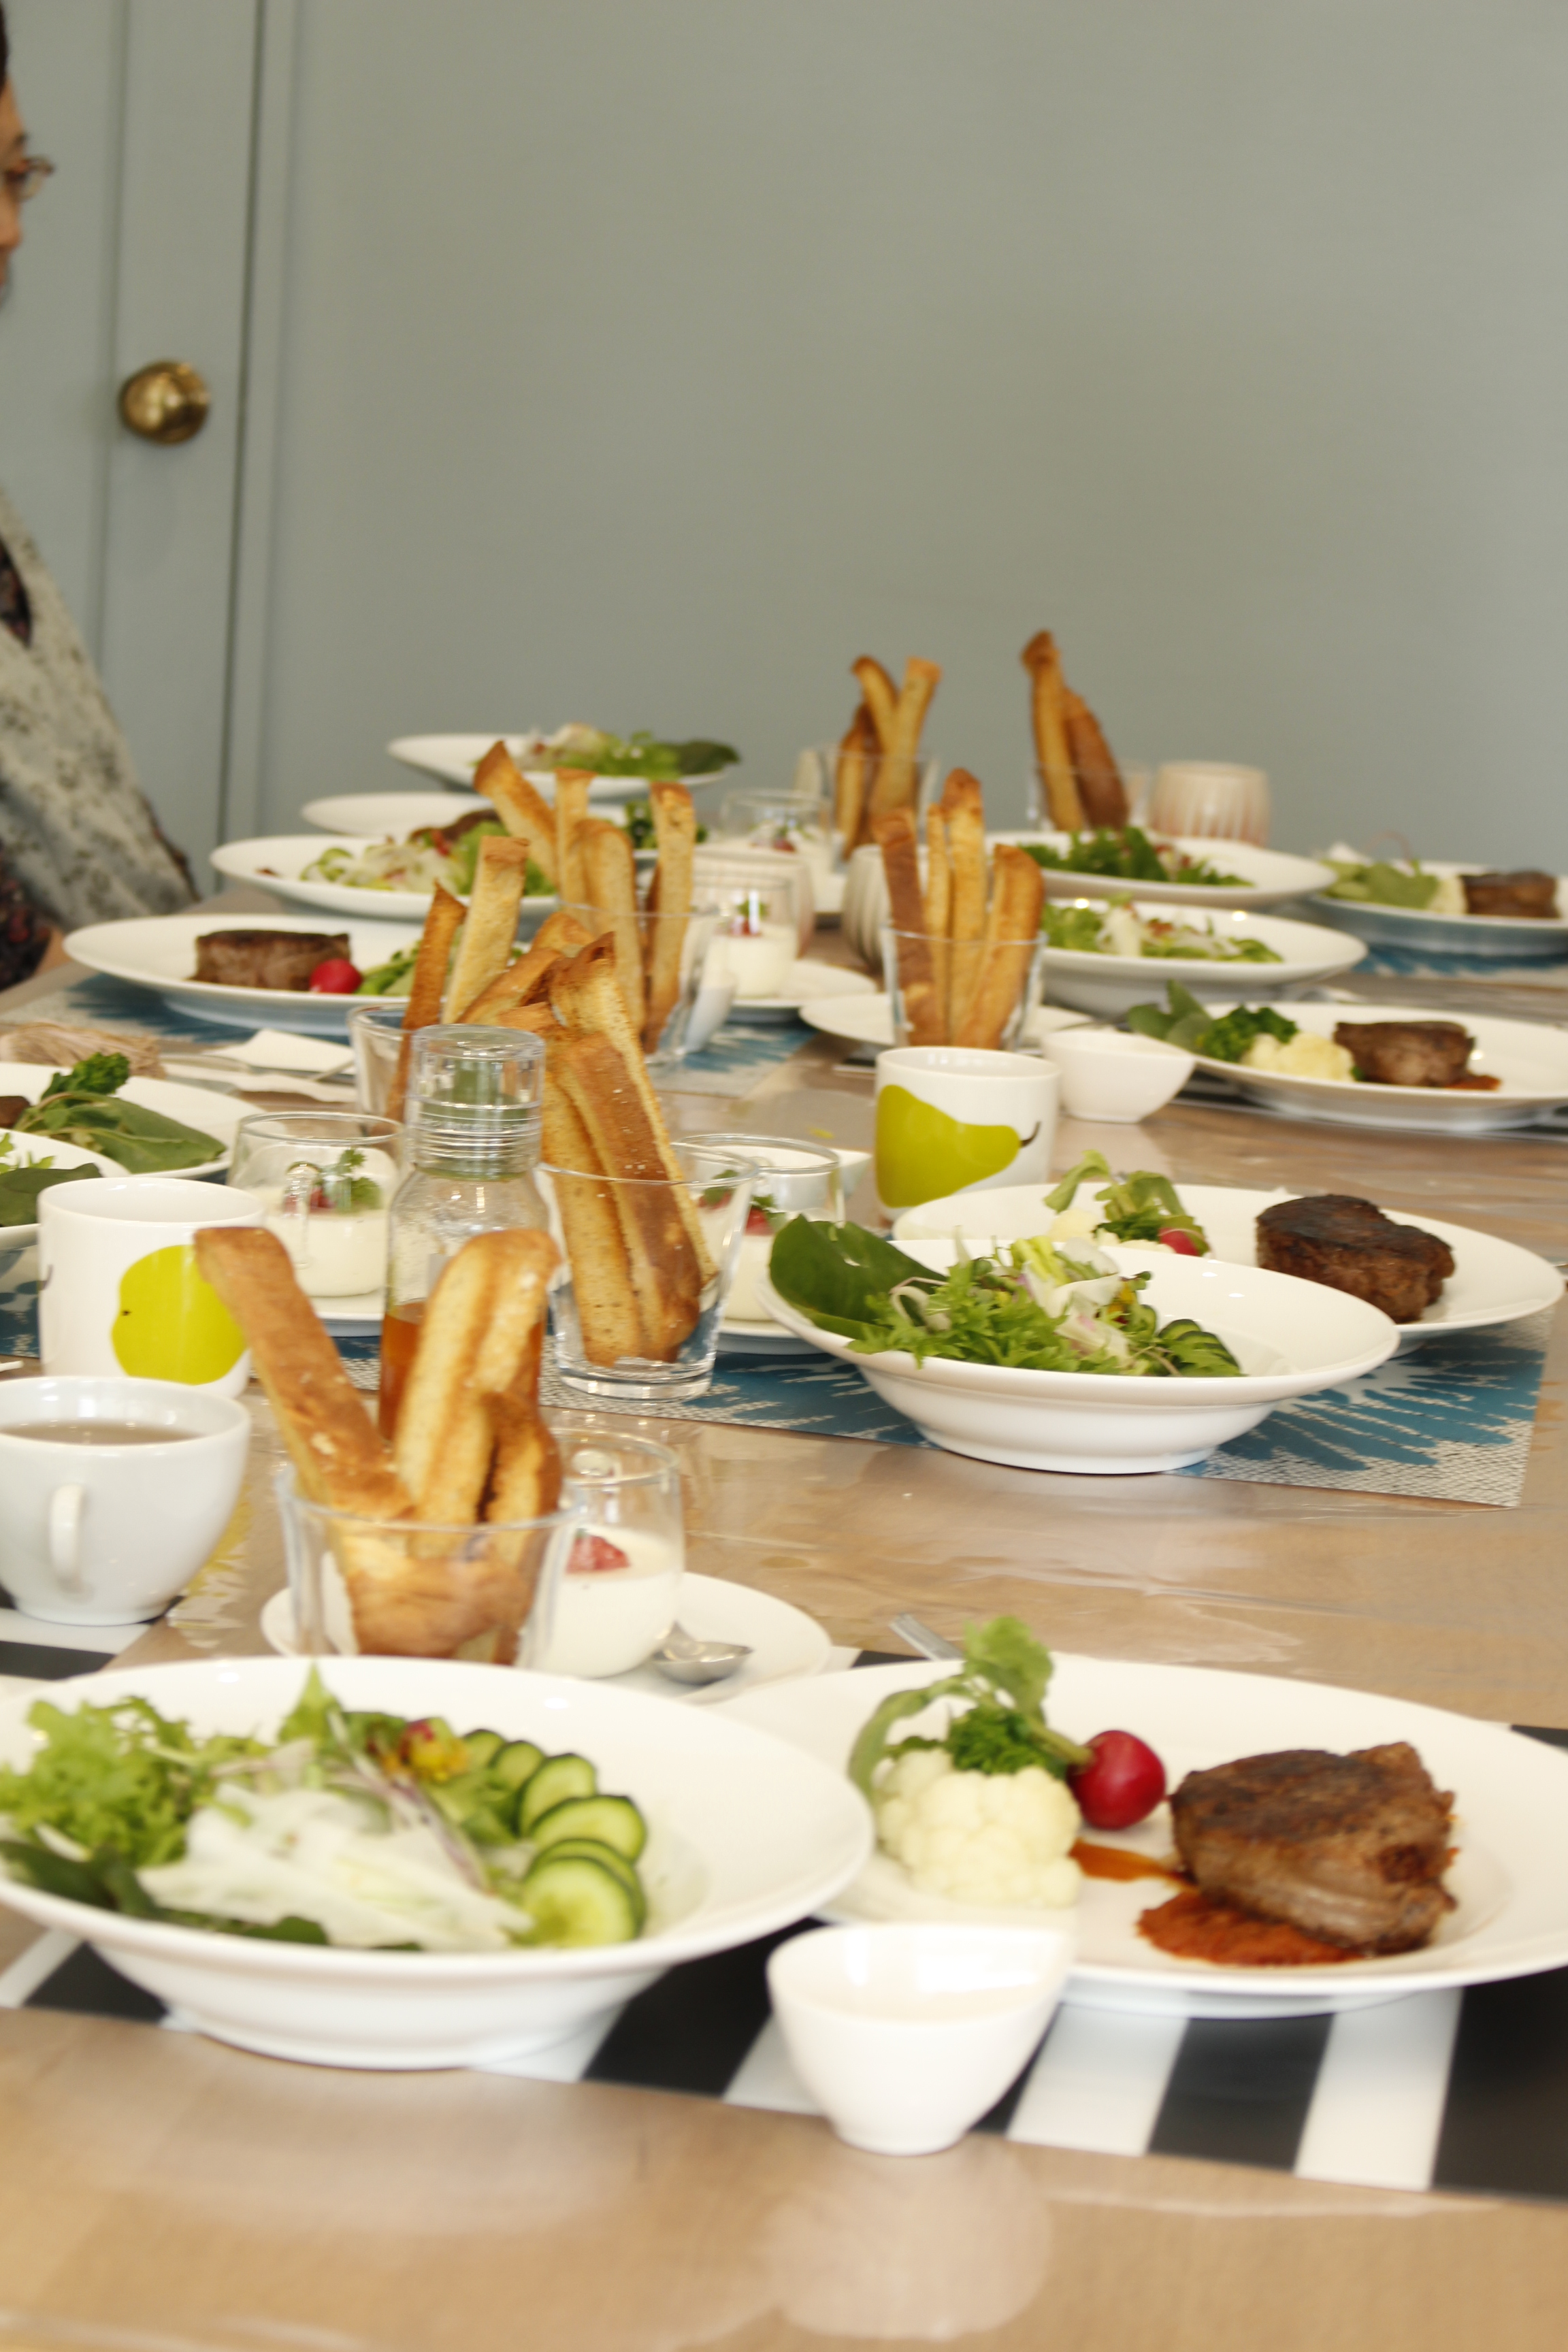 a-ta-sante糖質制限パン料理教室。3月度『糖質制限家庭料理教室』阿倍野区西田辺。